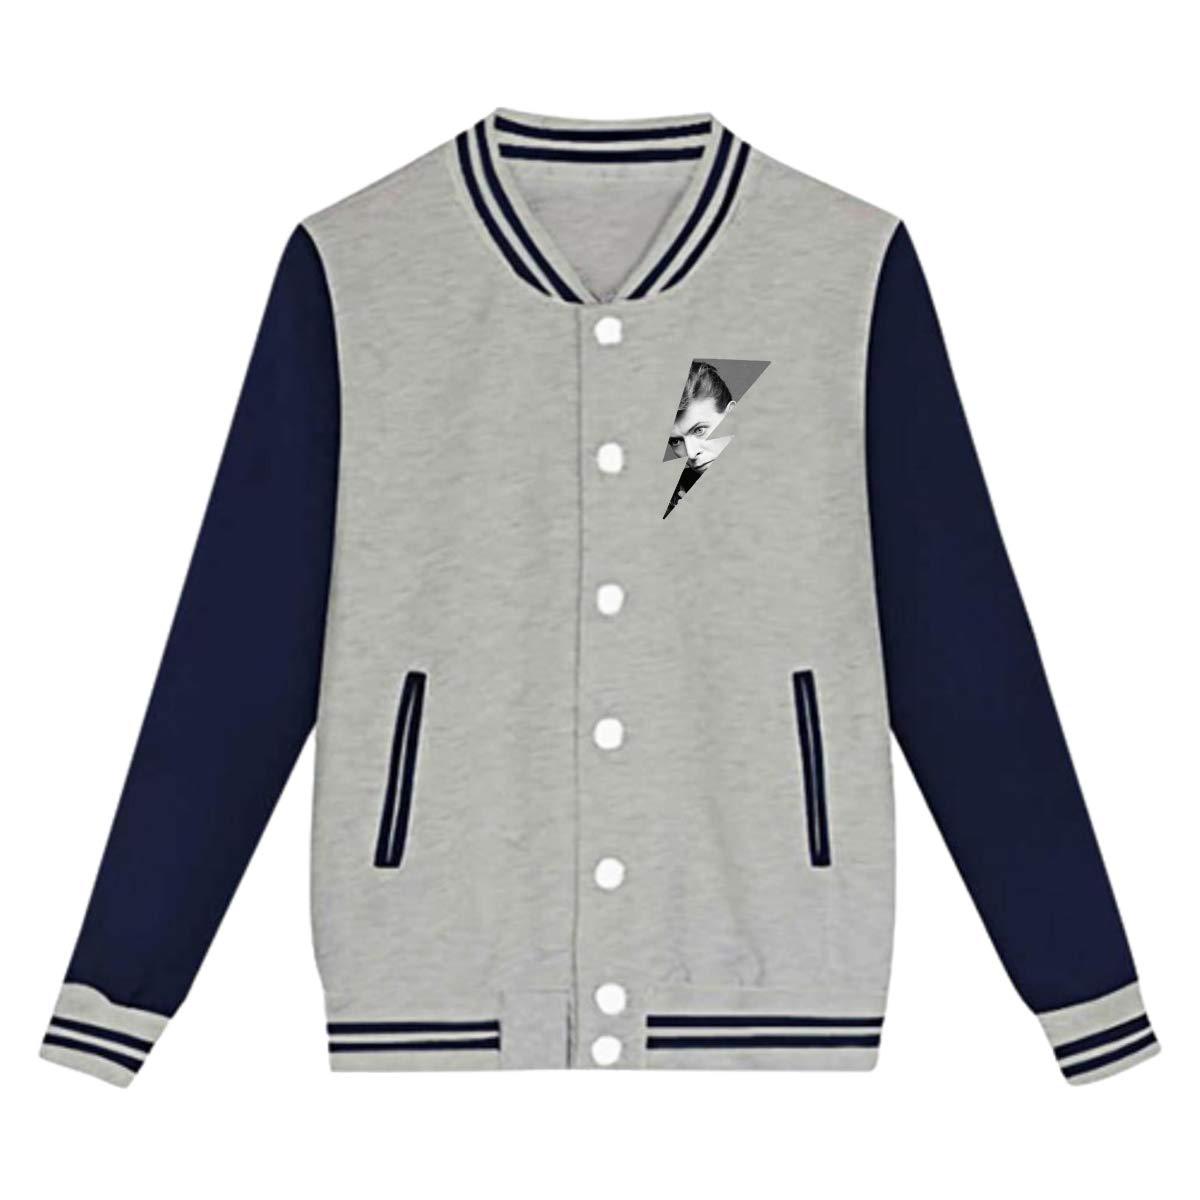 LIALUER David Bowie Logo Design Boys Kids Baseball Jacket Uniform V Sweater Coat